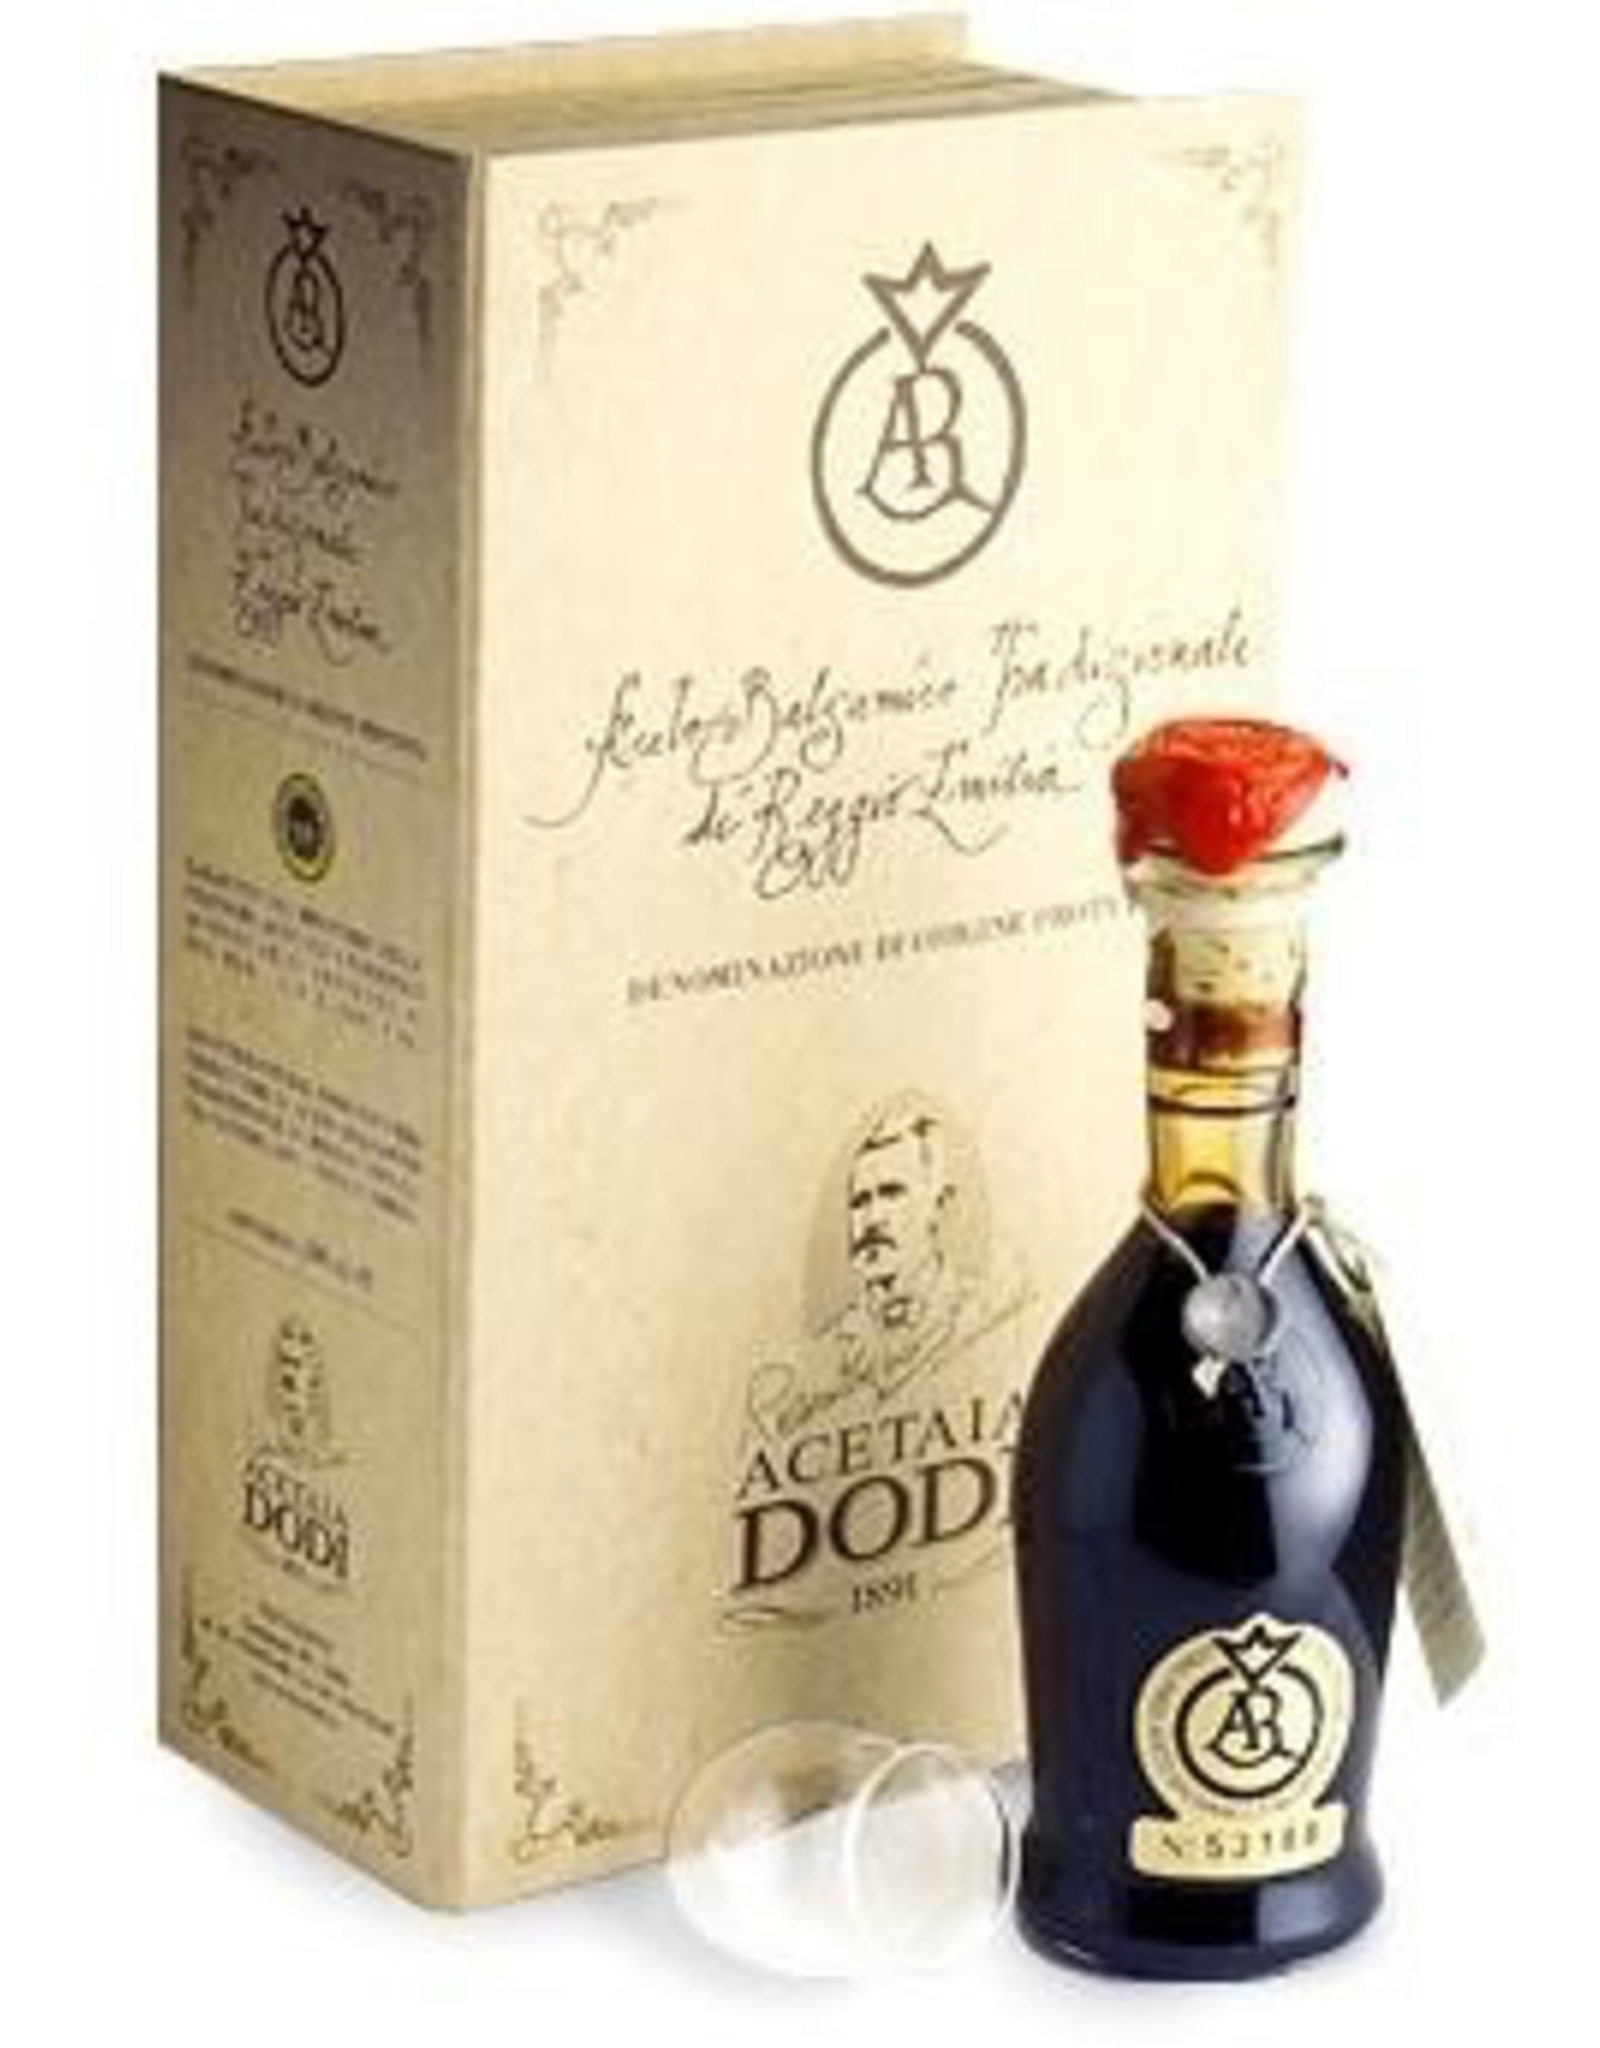 Specialty Foods Reggio Emilia, Acetaia Dodi Balsamic Vinegar Of Reggio Emilia, Crimson Seal Aragosta, Aged over 12 Years in Wood, Balsamic Vinegar, Modena, Italy, 100ml